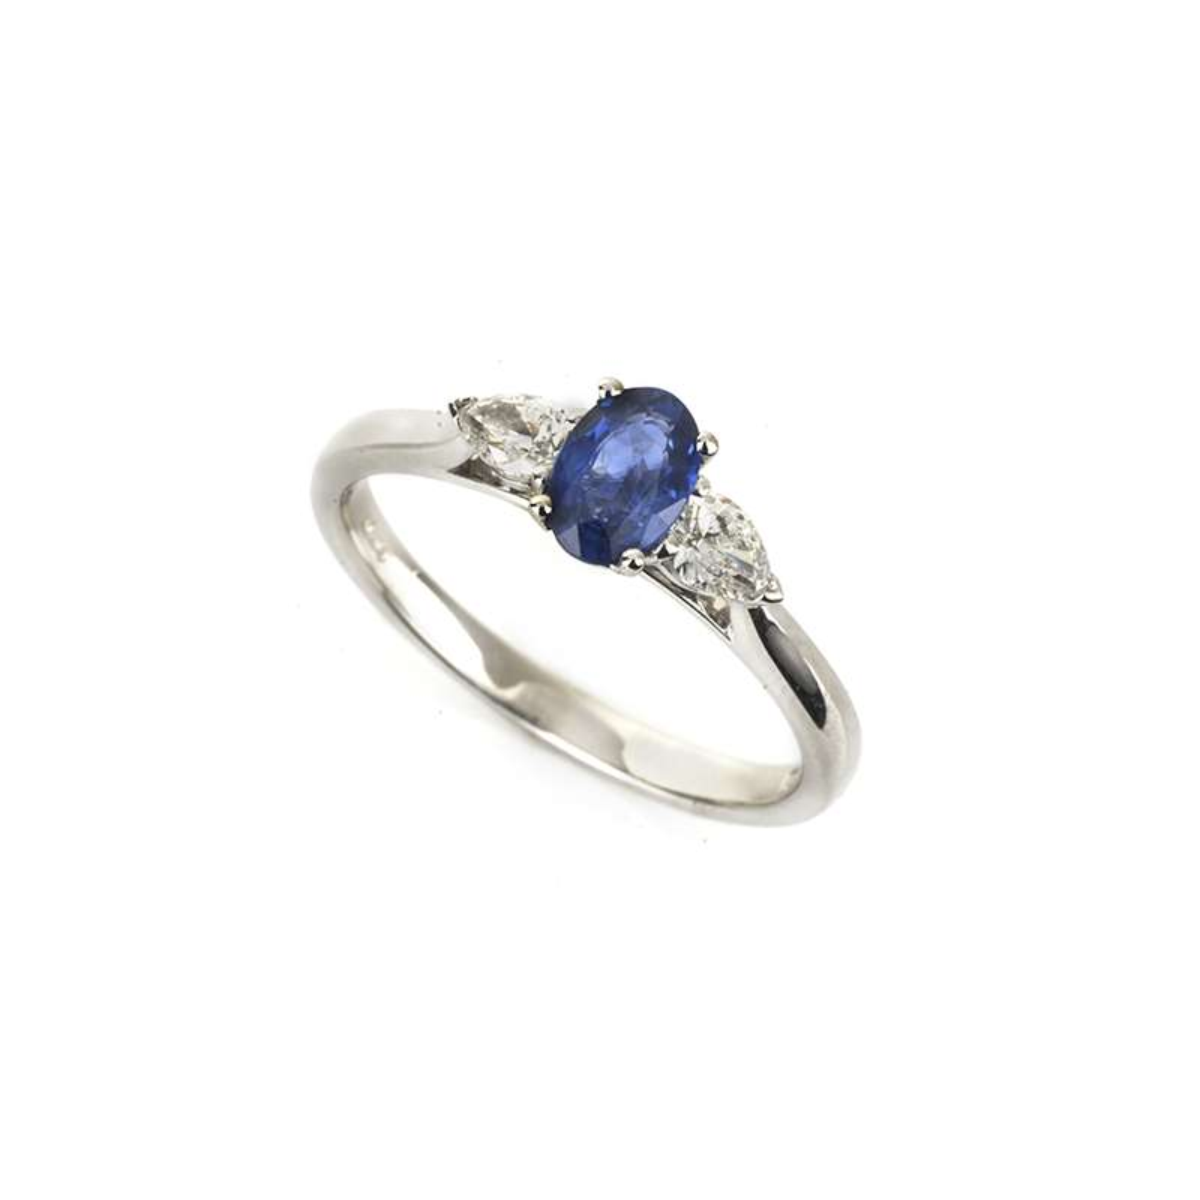 18k White Gold Sapphire and Diamond Ring 0.26ct